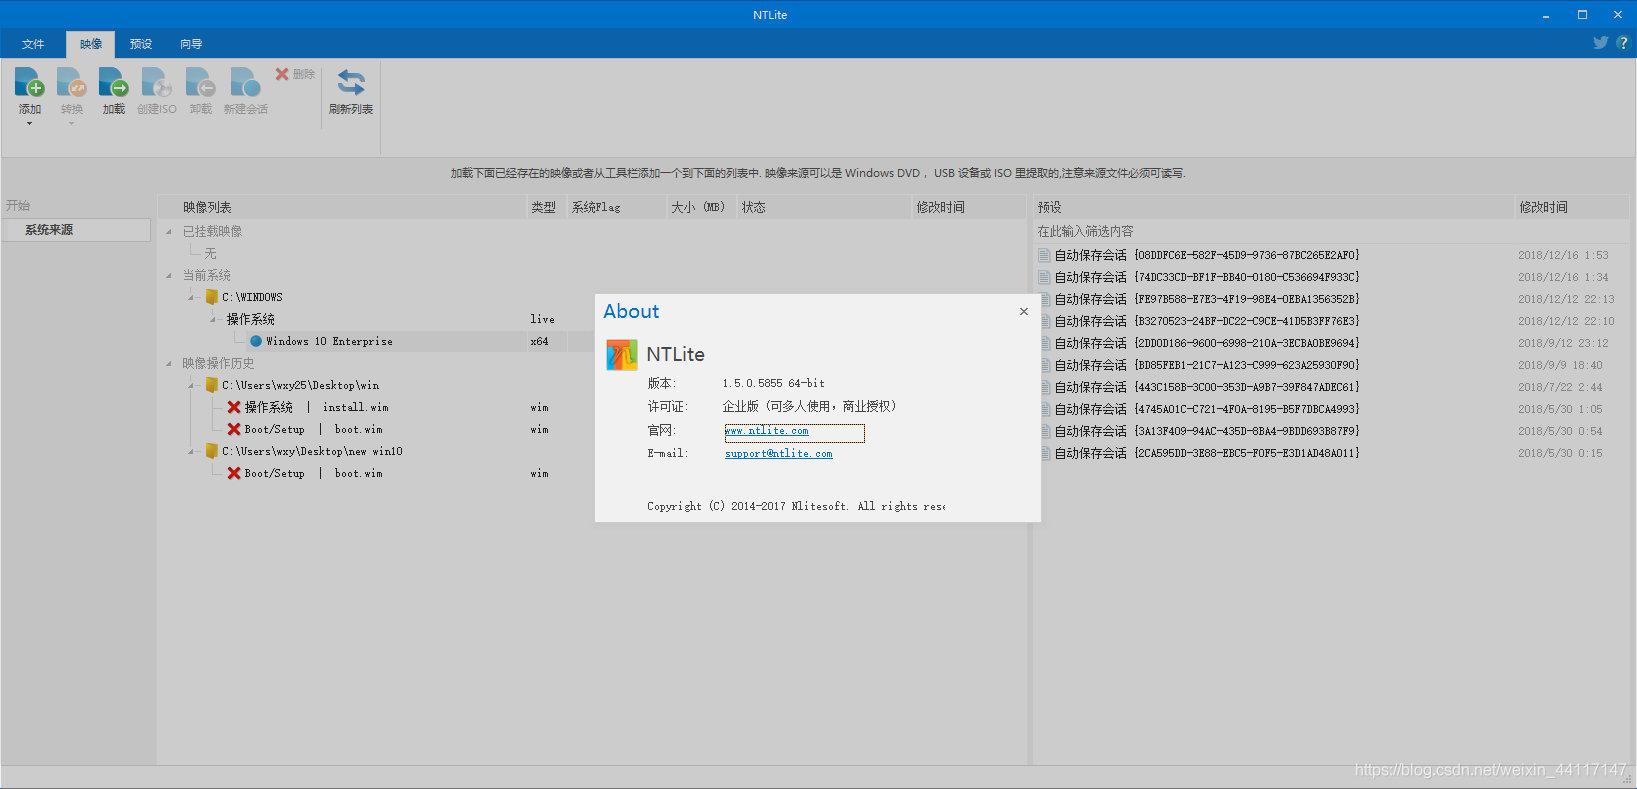 Win10系统精简优化工具 NTLite v1.5.0 企业版